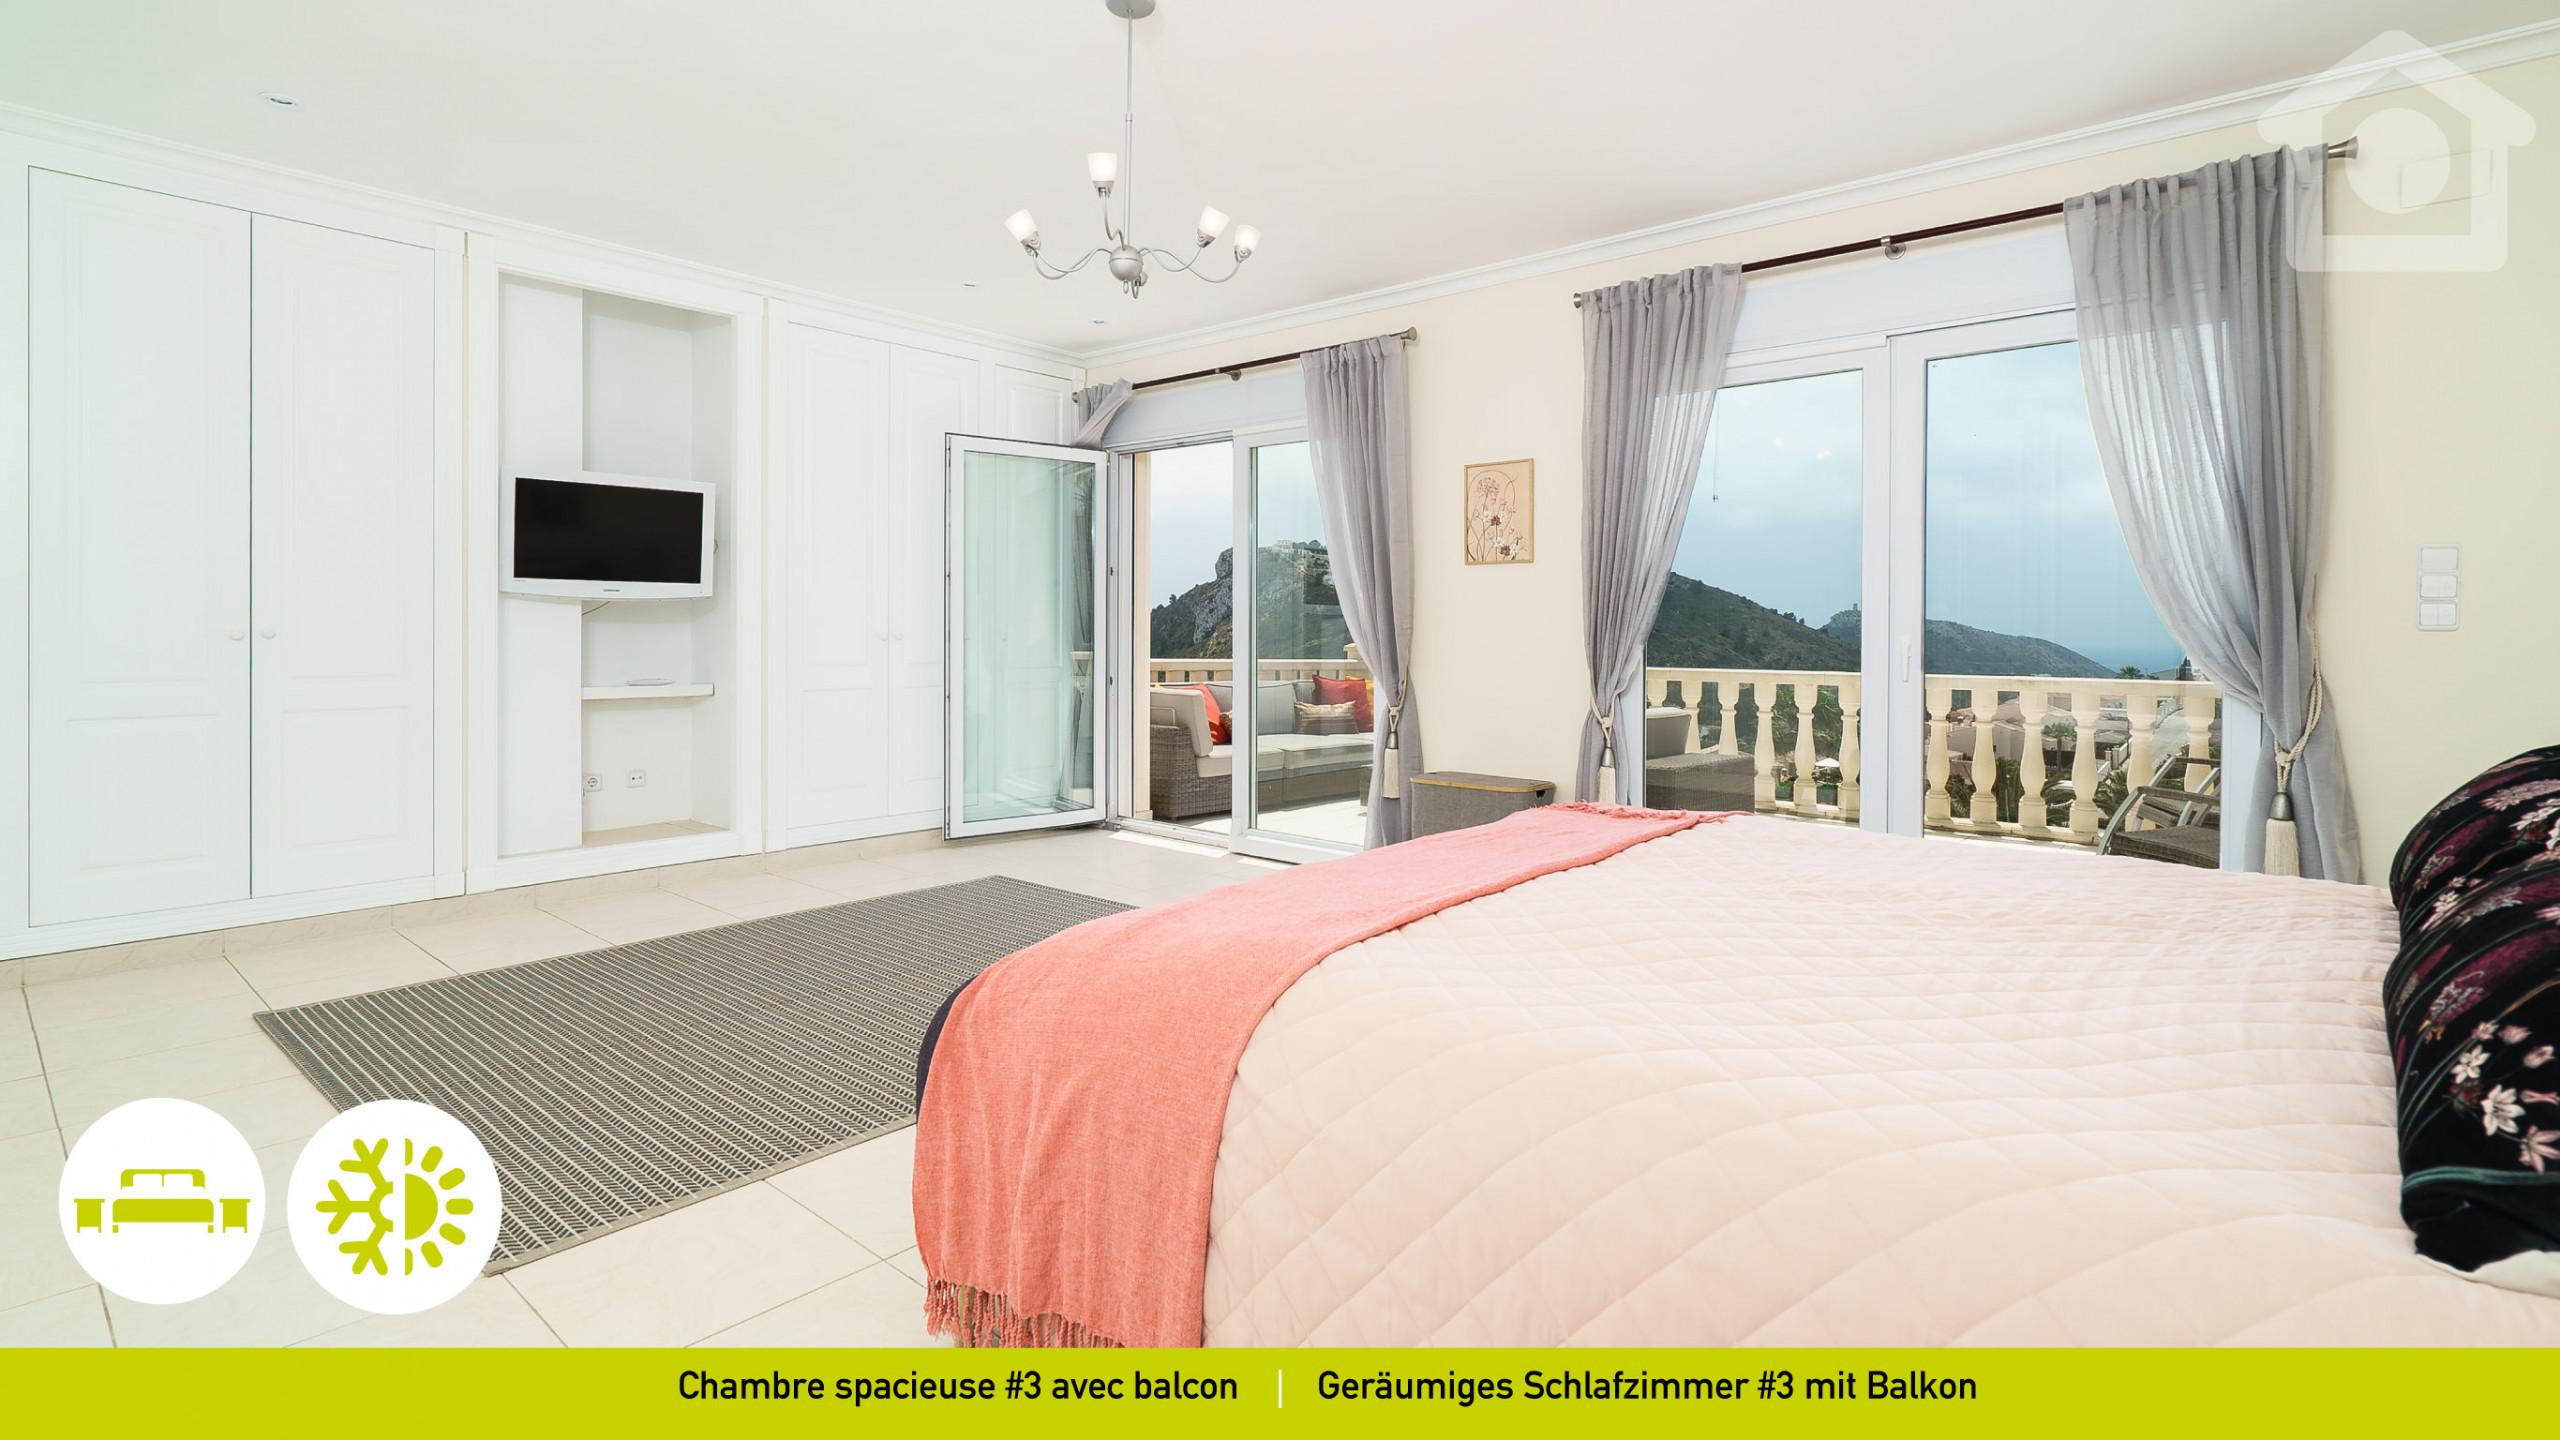 10 modern schlafzimmer bank designs, villas in moraira - solhabitat infinity moraira, Design ideen